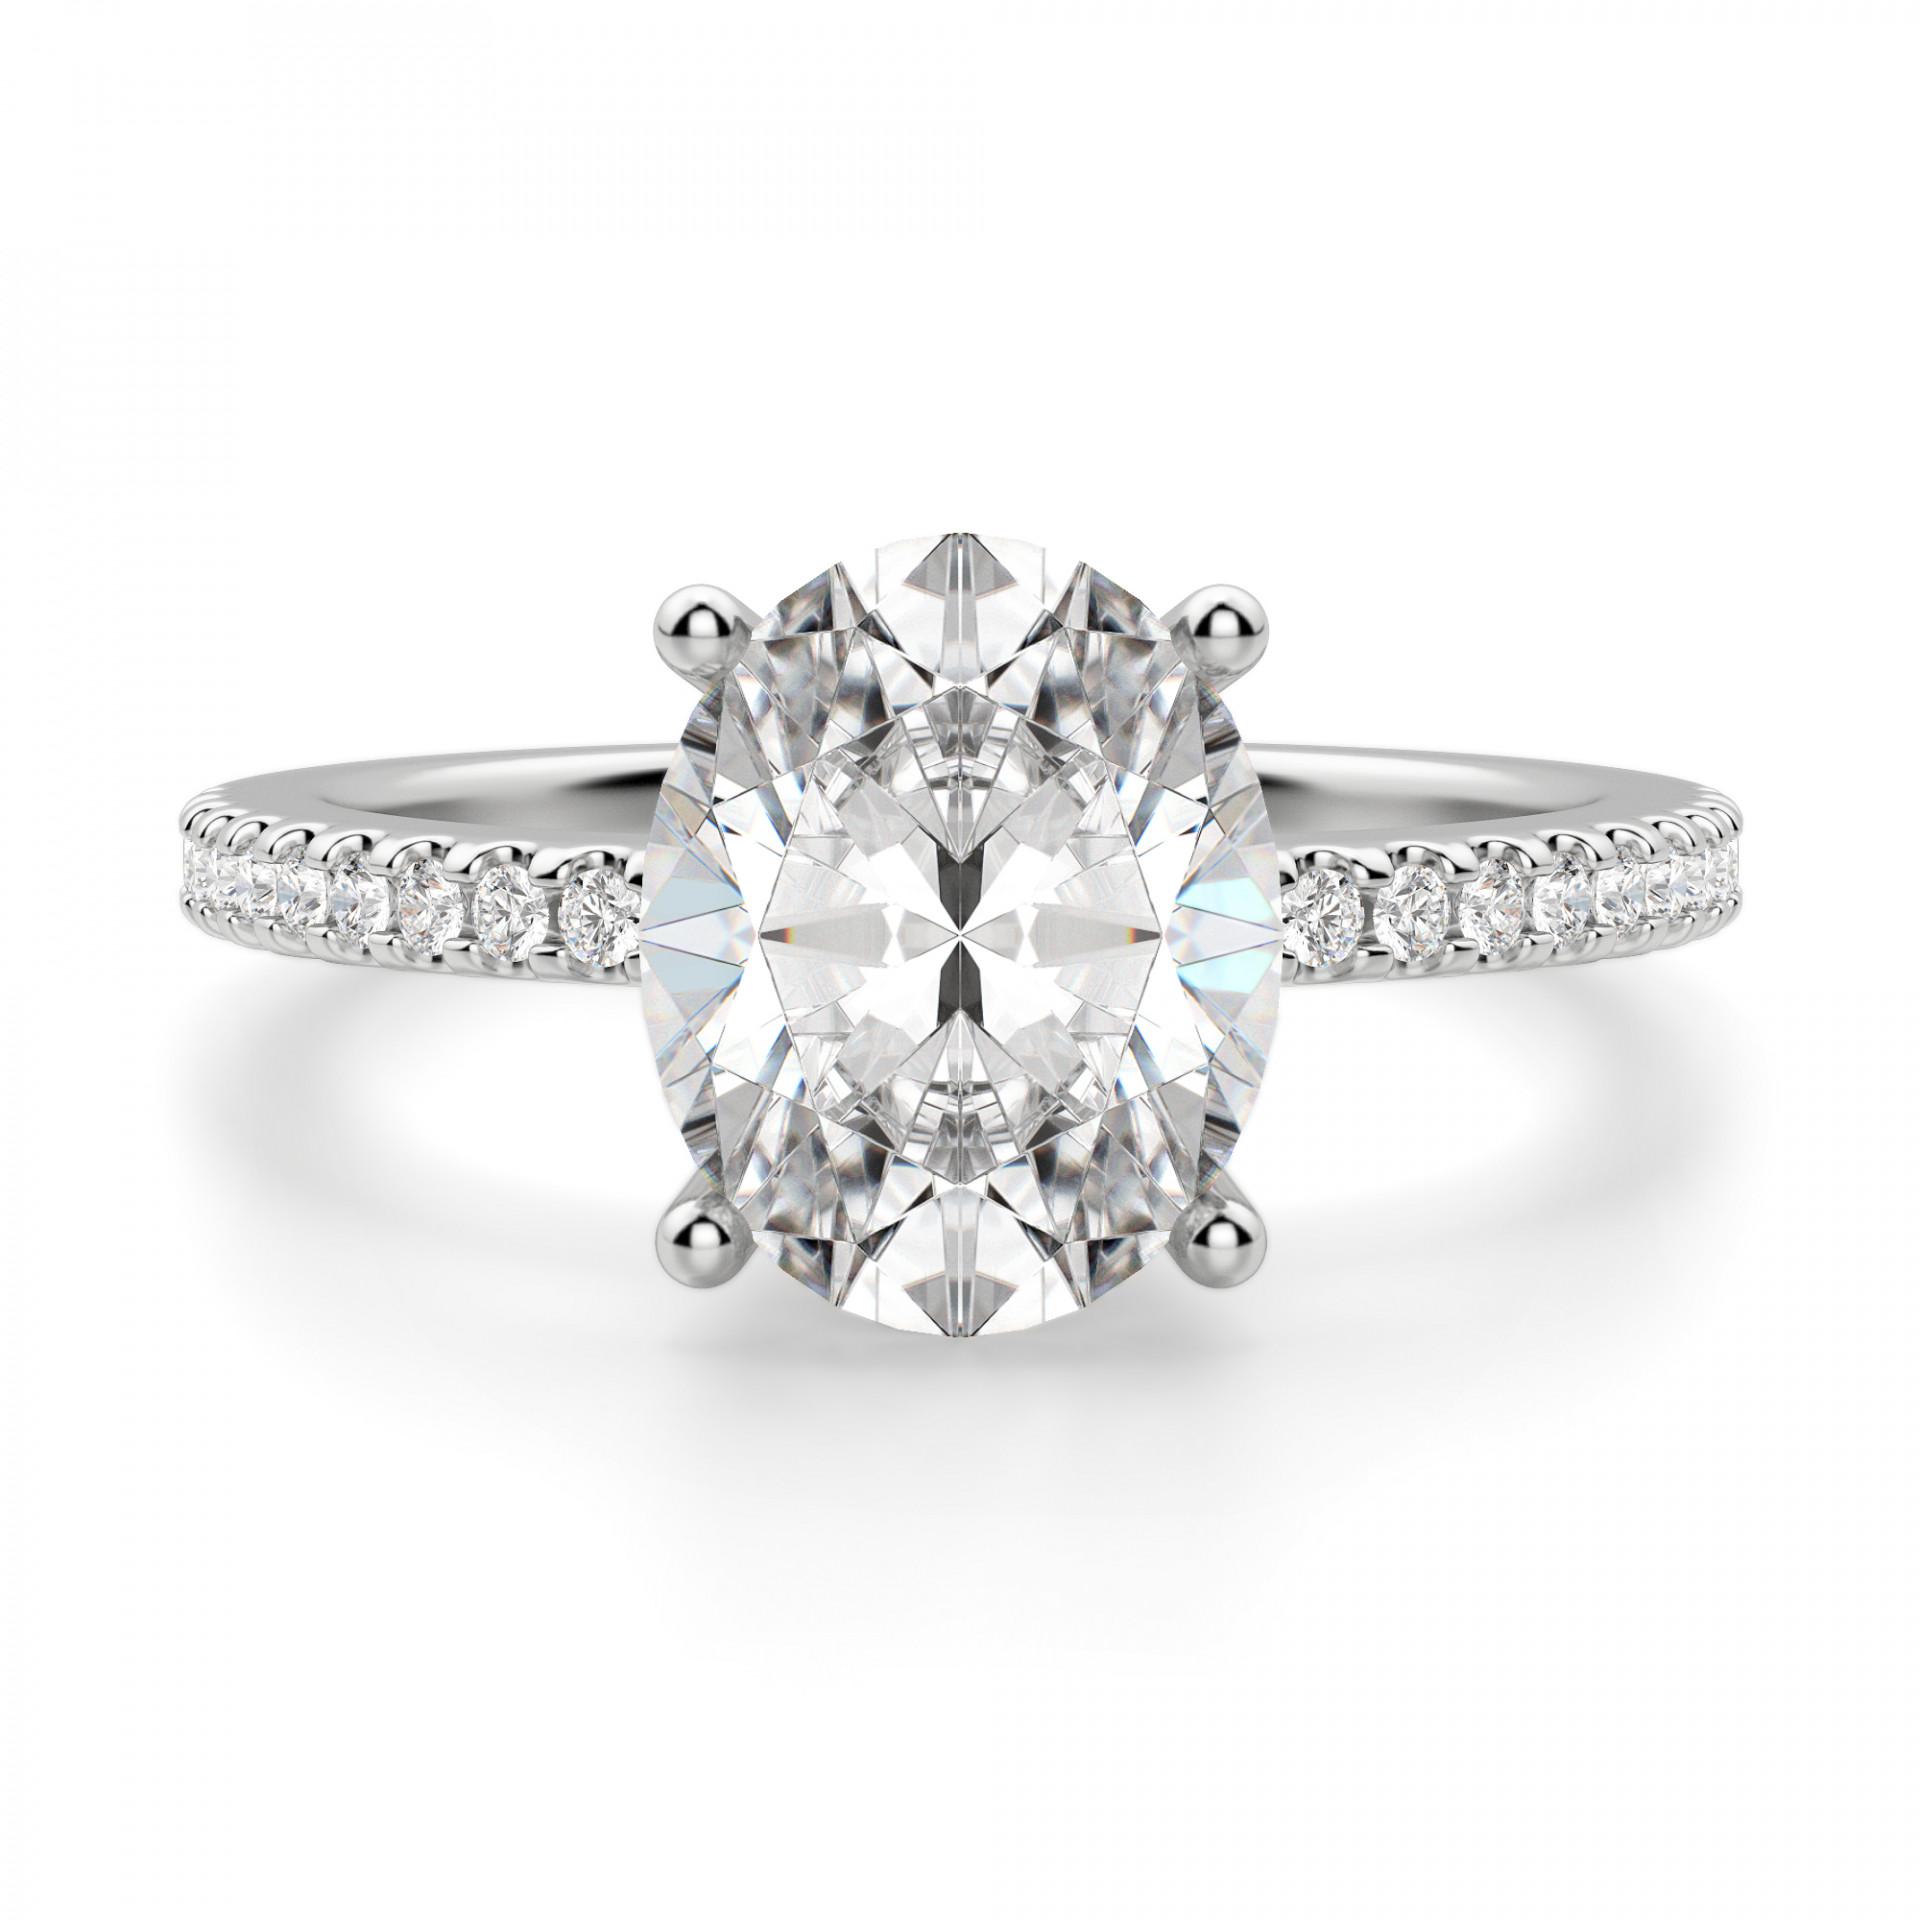 885ea1b5c5dca Basket Set 2.54 carat Oval cut Accented Engagement Ring